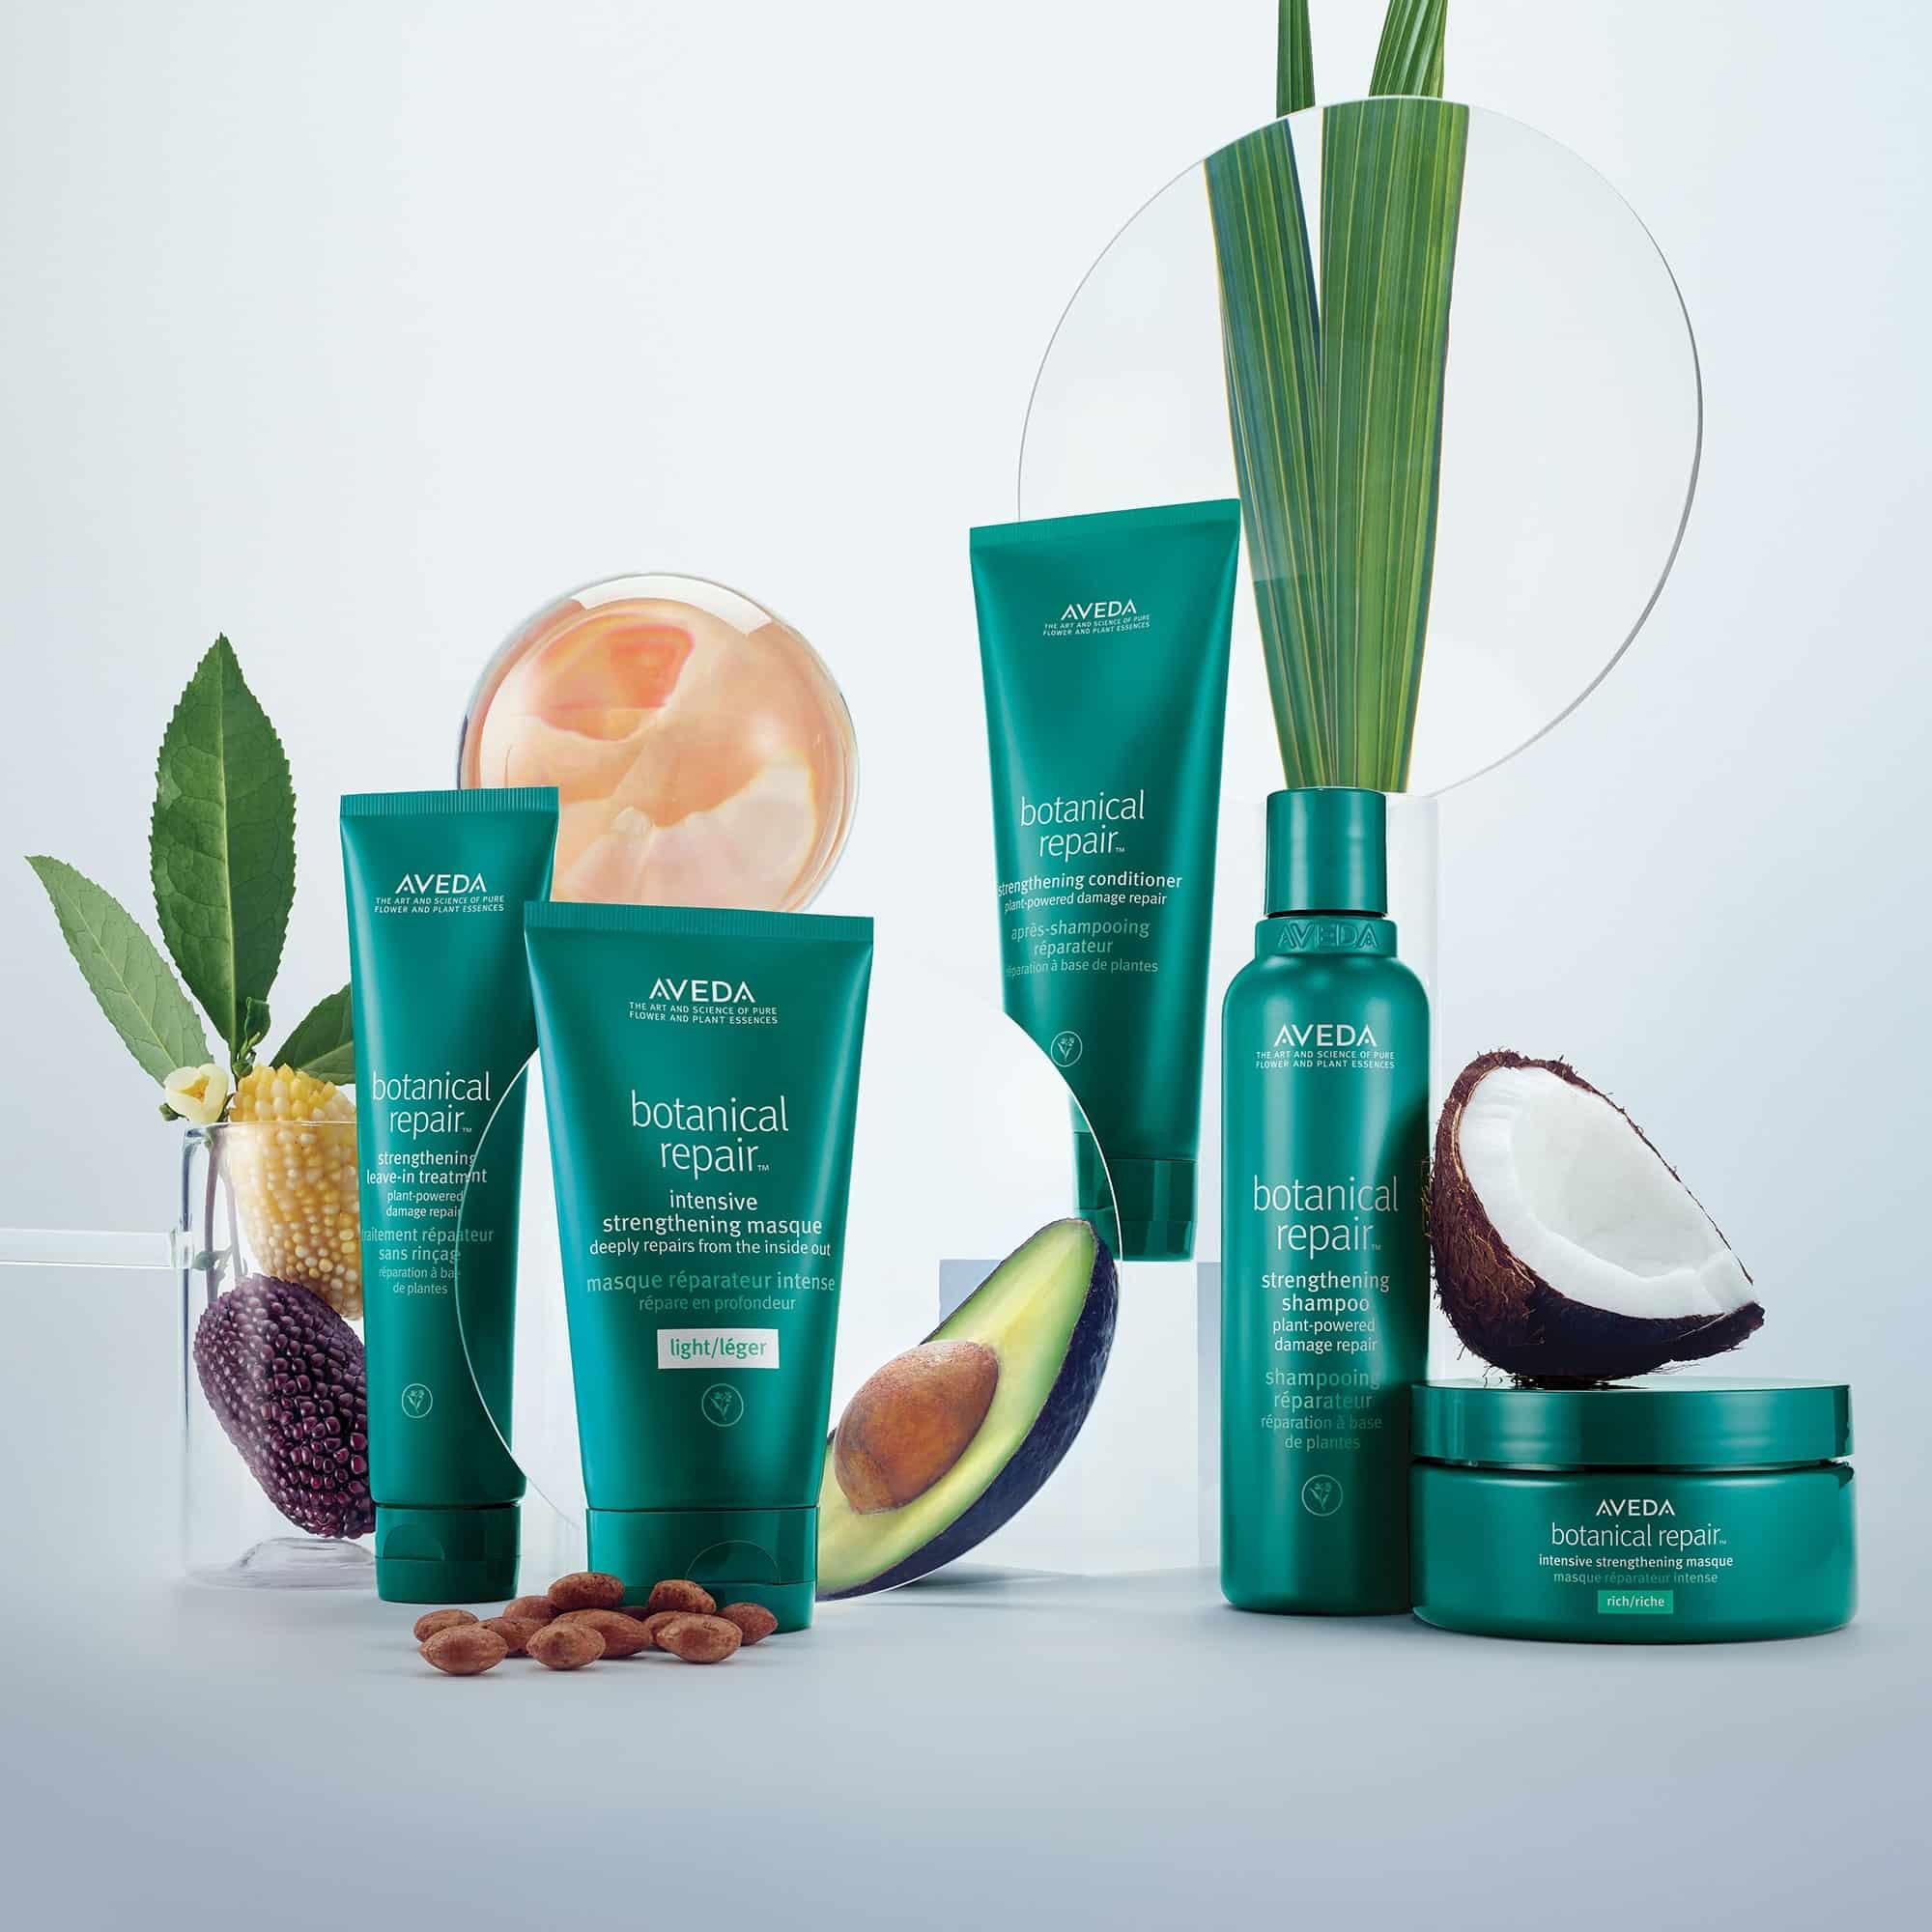 AVEDAAVEDA Botanical Repair Strengthening Produkte-min Botanical Repair Strengthening Produkte-min